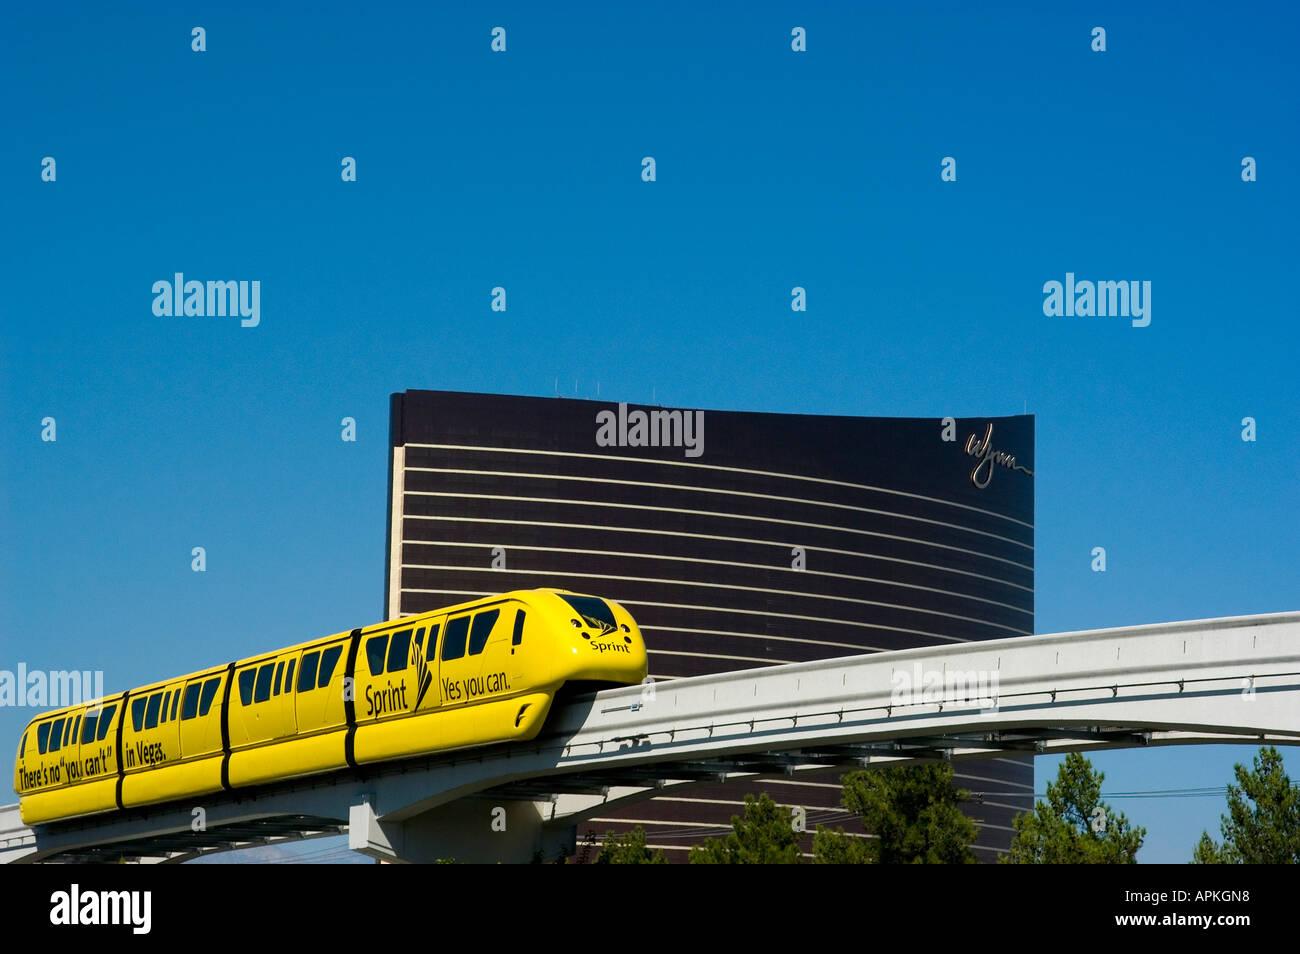 Monorail passing Wynn Hotel and Casino NV Las Vegas city scene - Stock Image